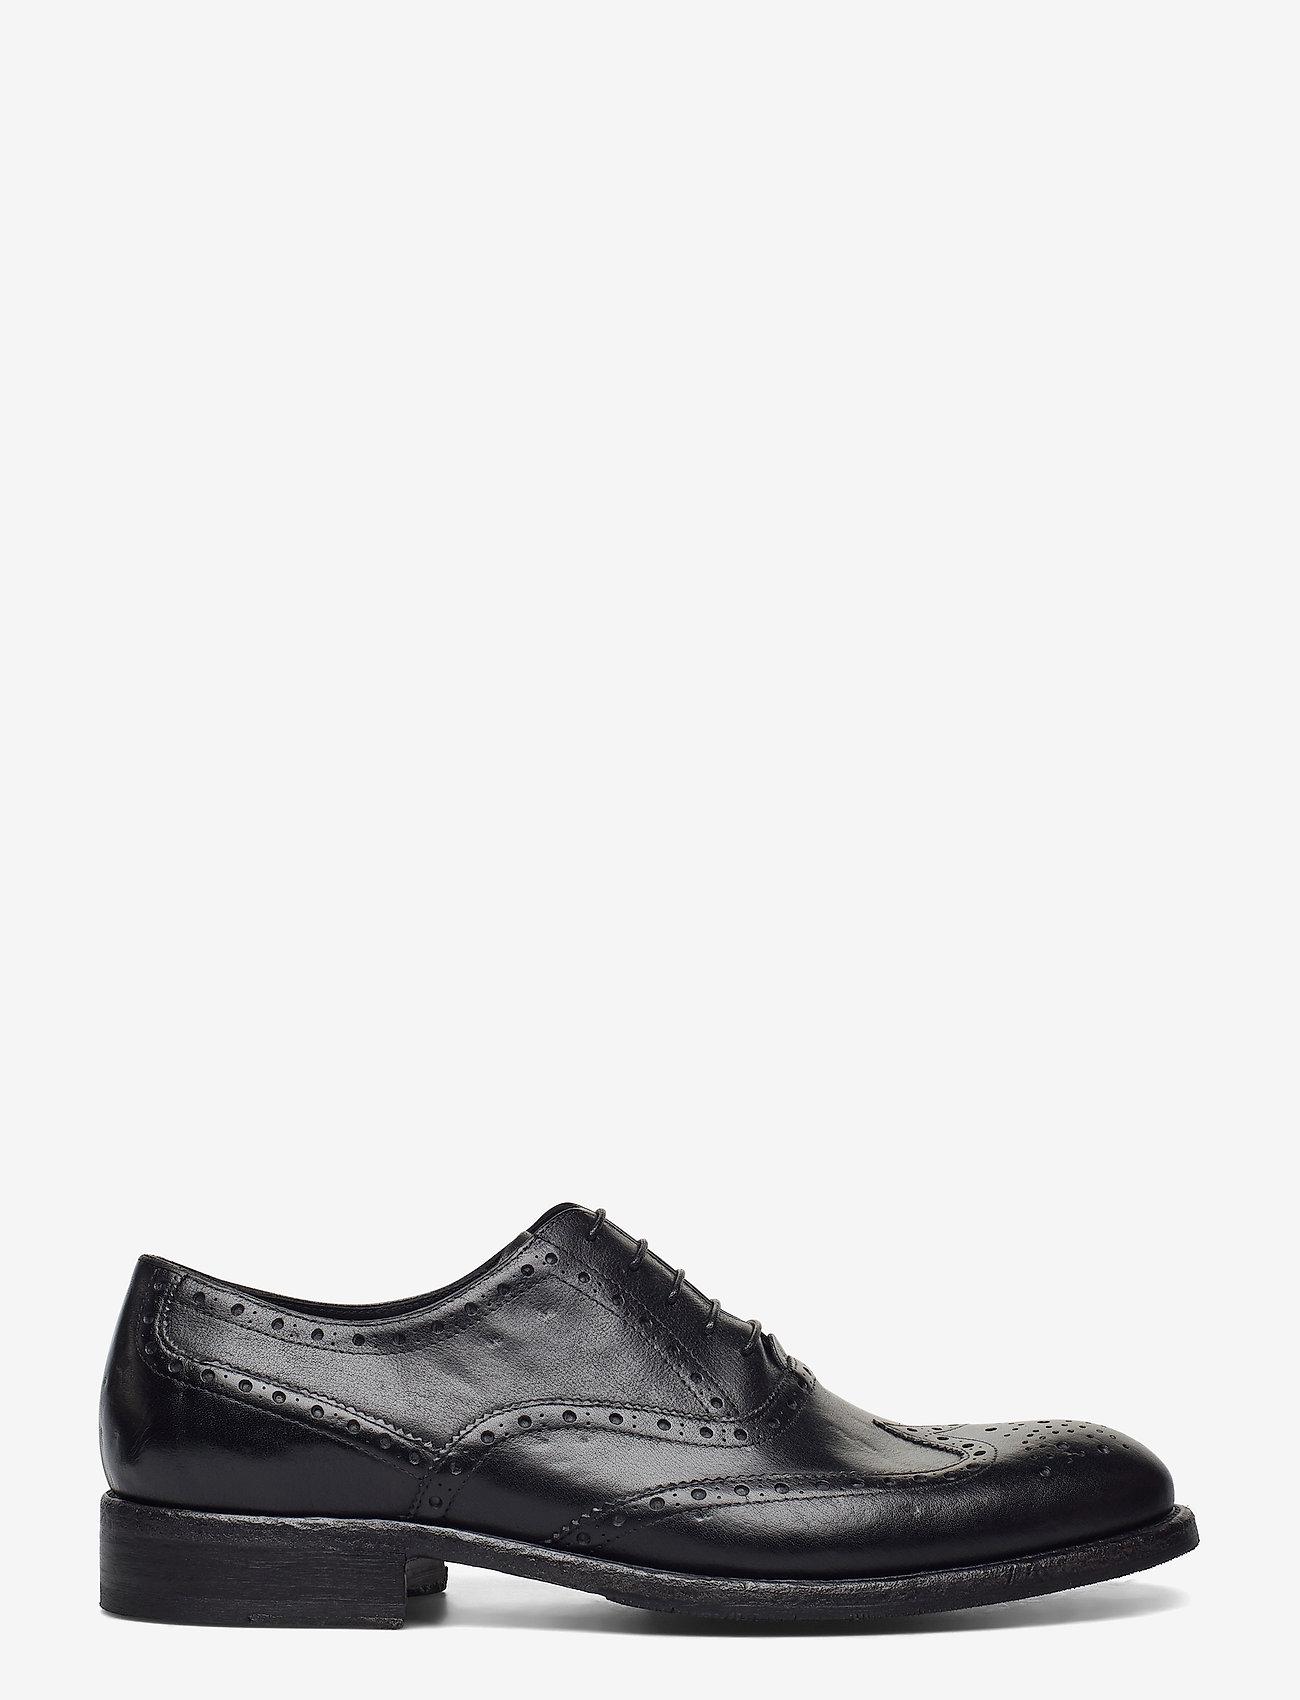 SAND - Footwear MW - F316 - snörskor - black - 1